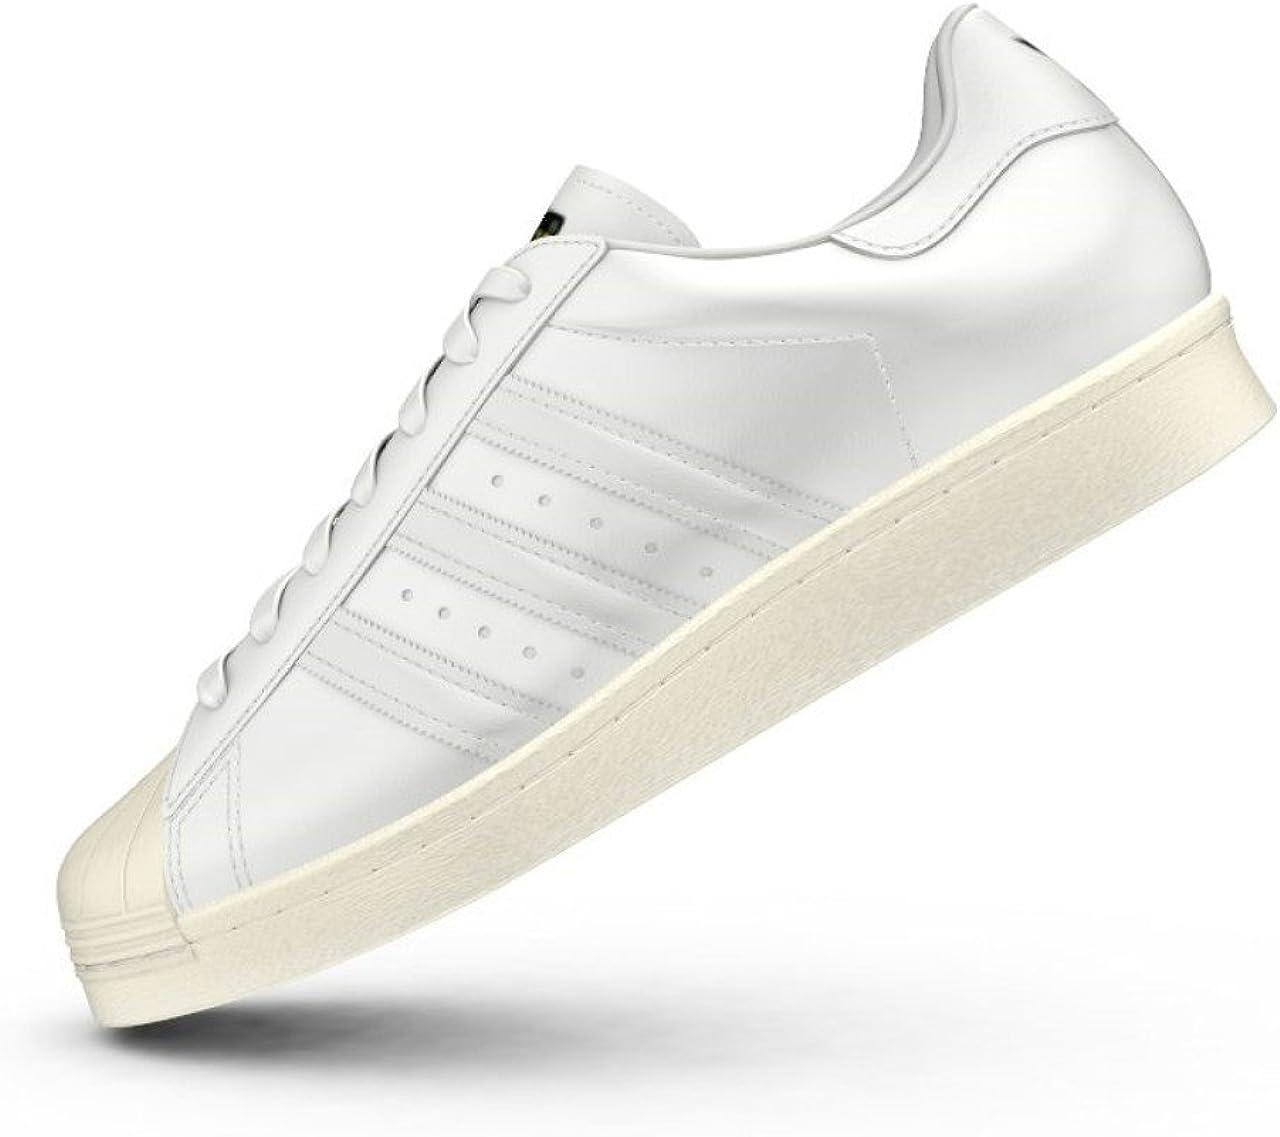 Adidas Superstar 80s Deluxe DLX, ftwr